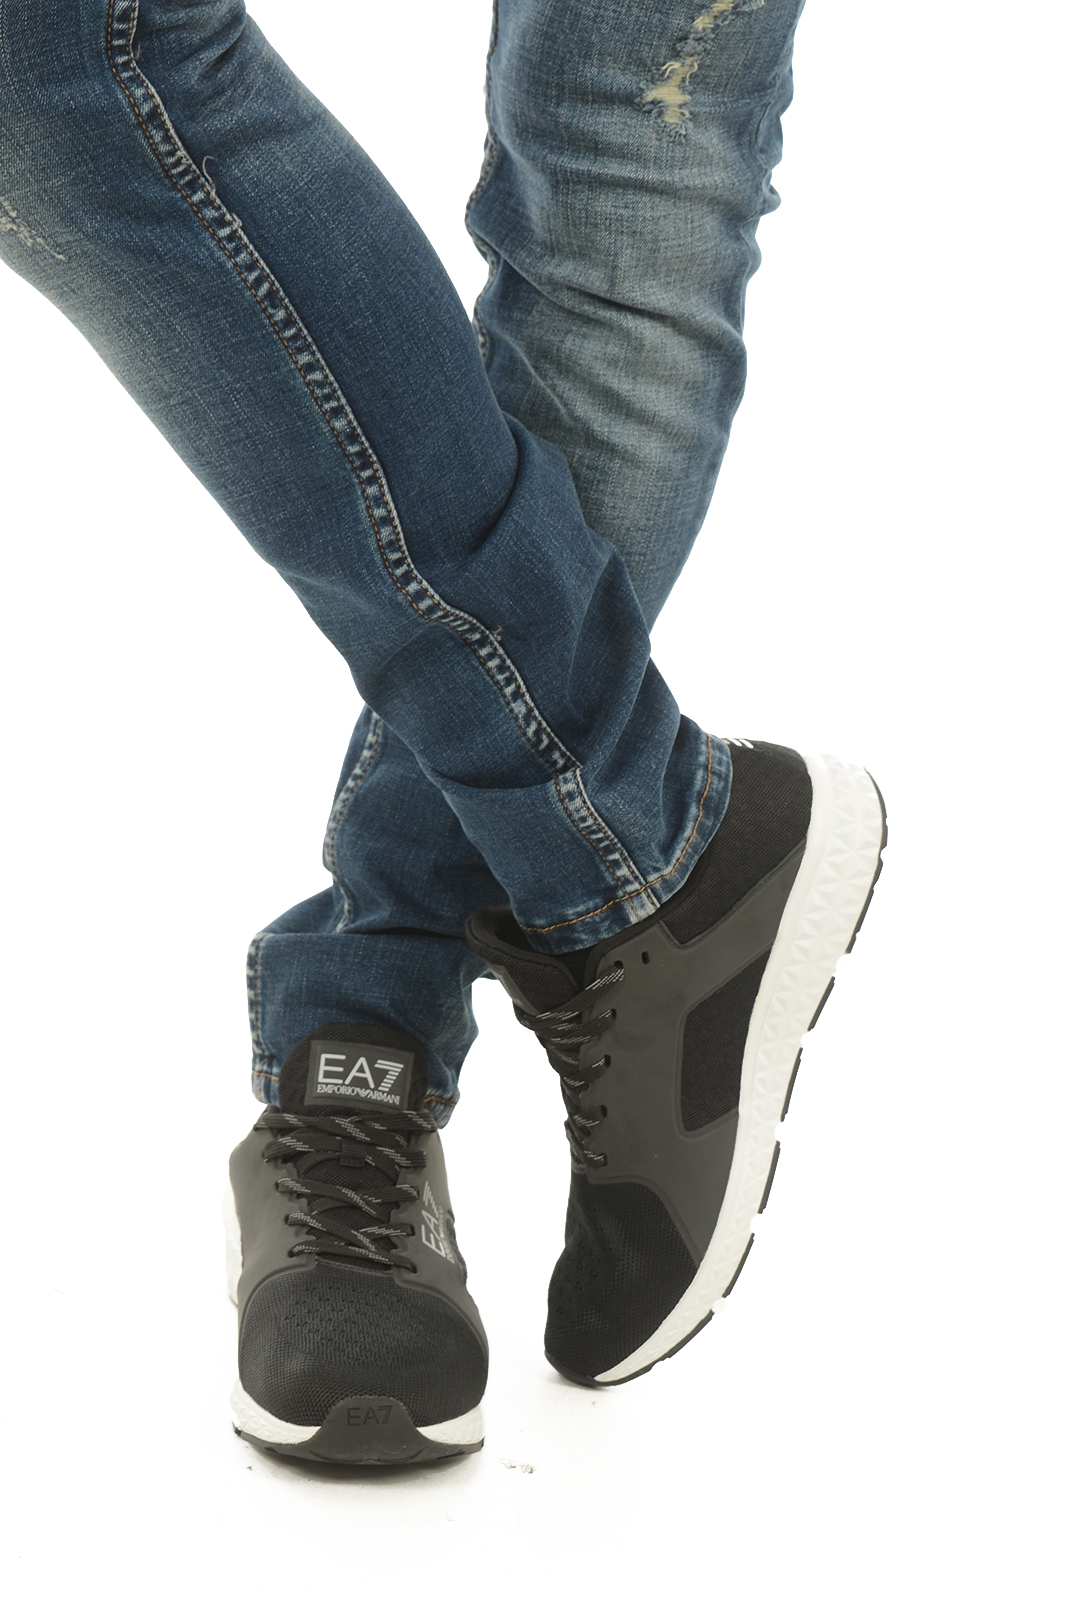 Chaussures   Emporio armani 248019 7A268 020 NOIR